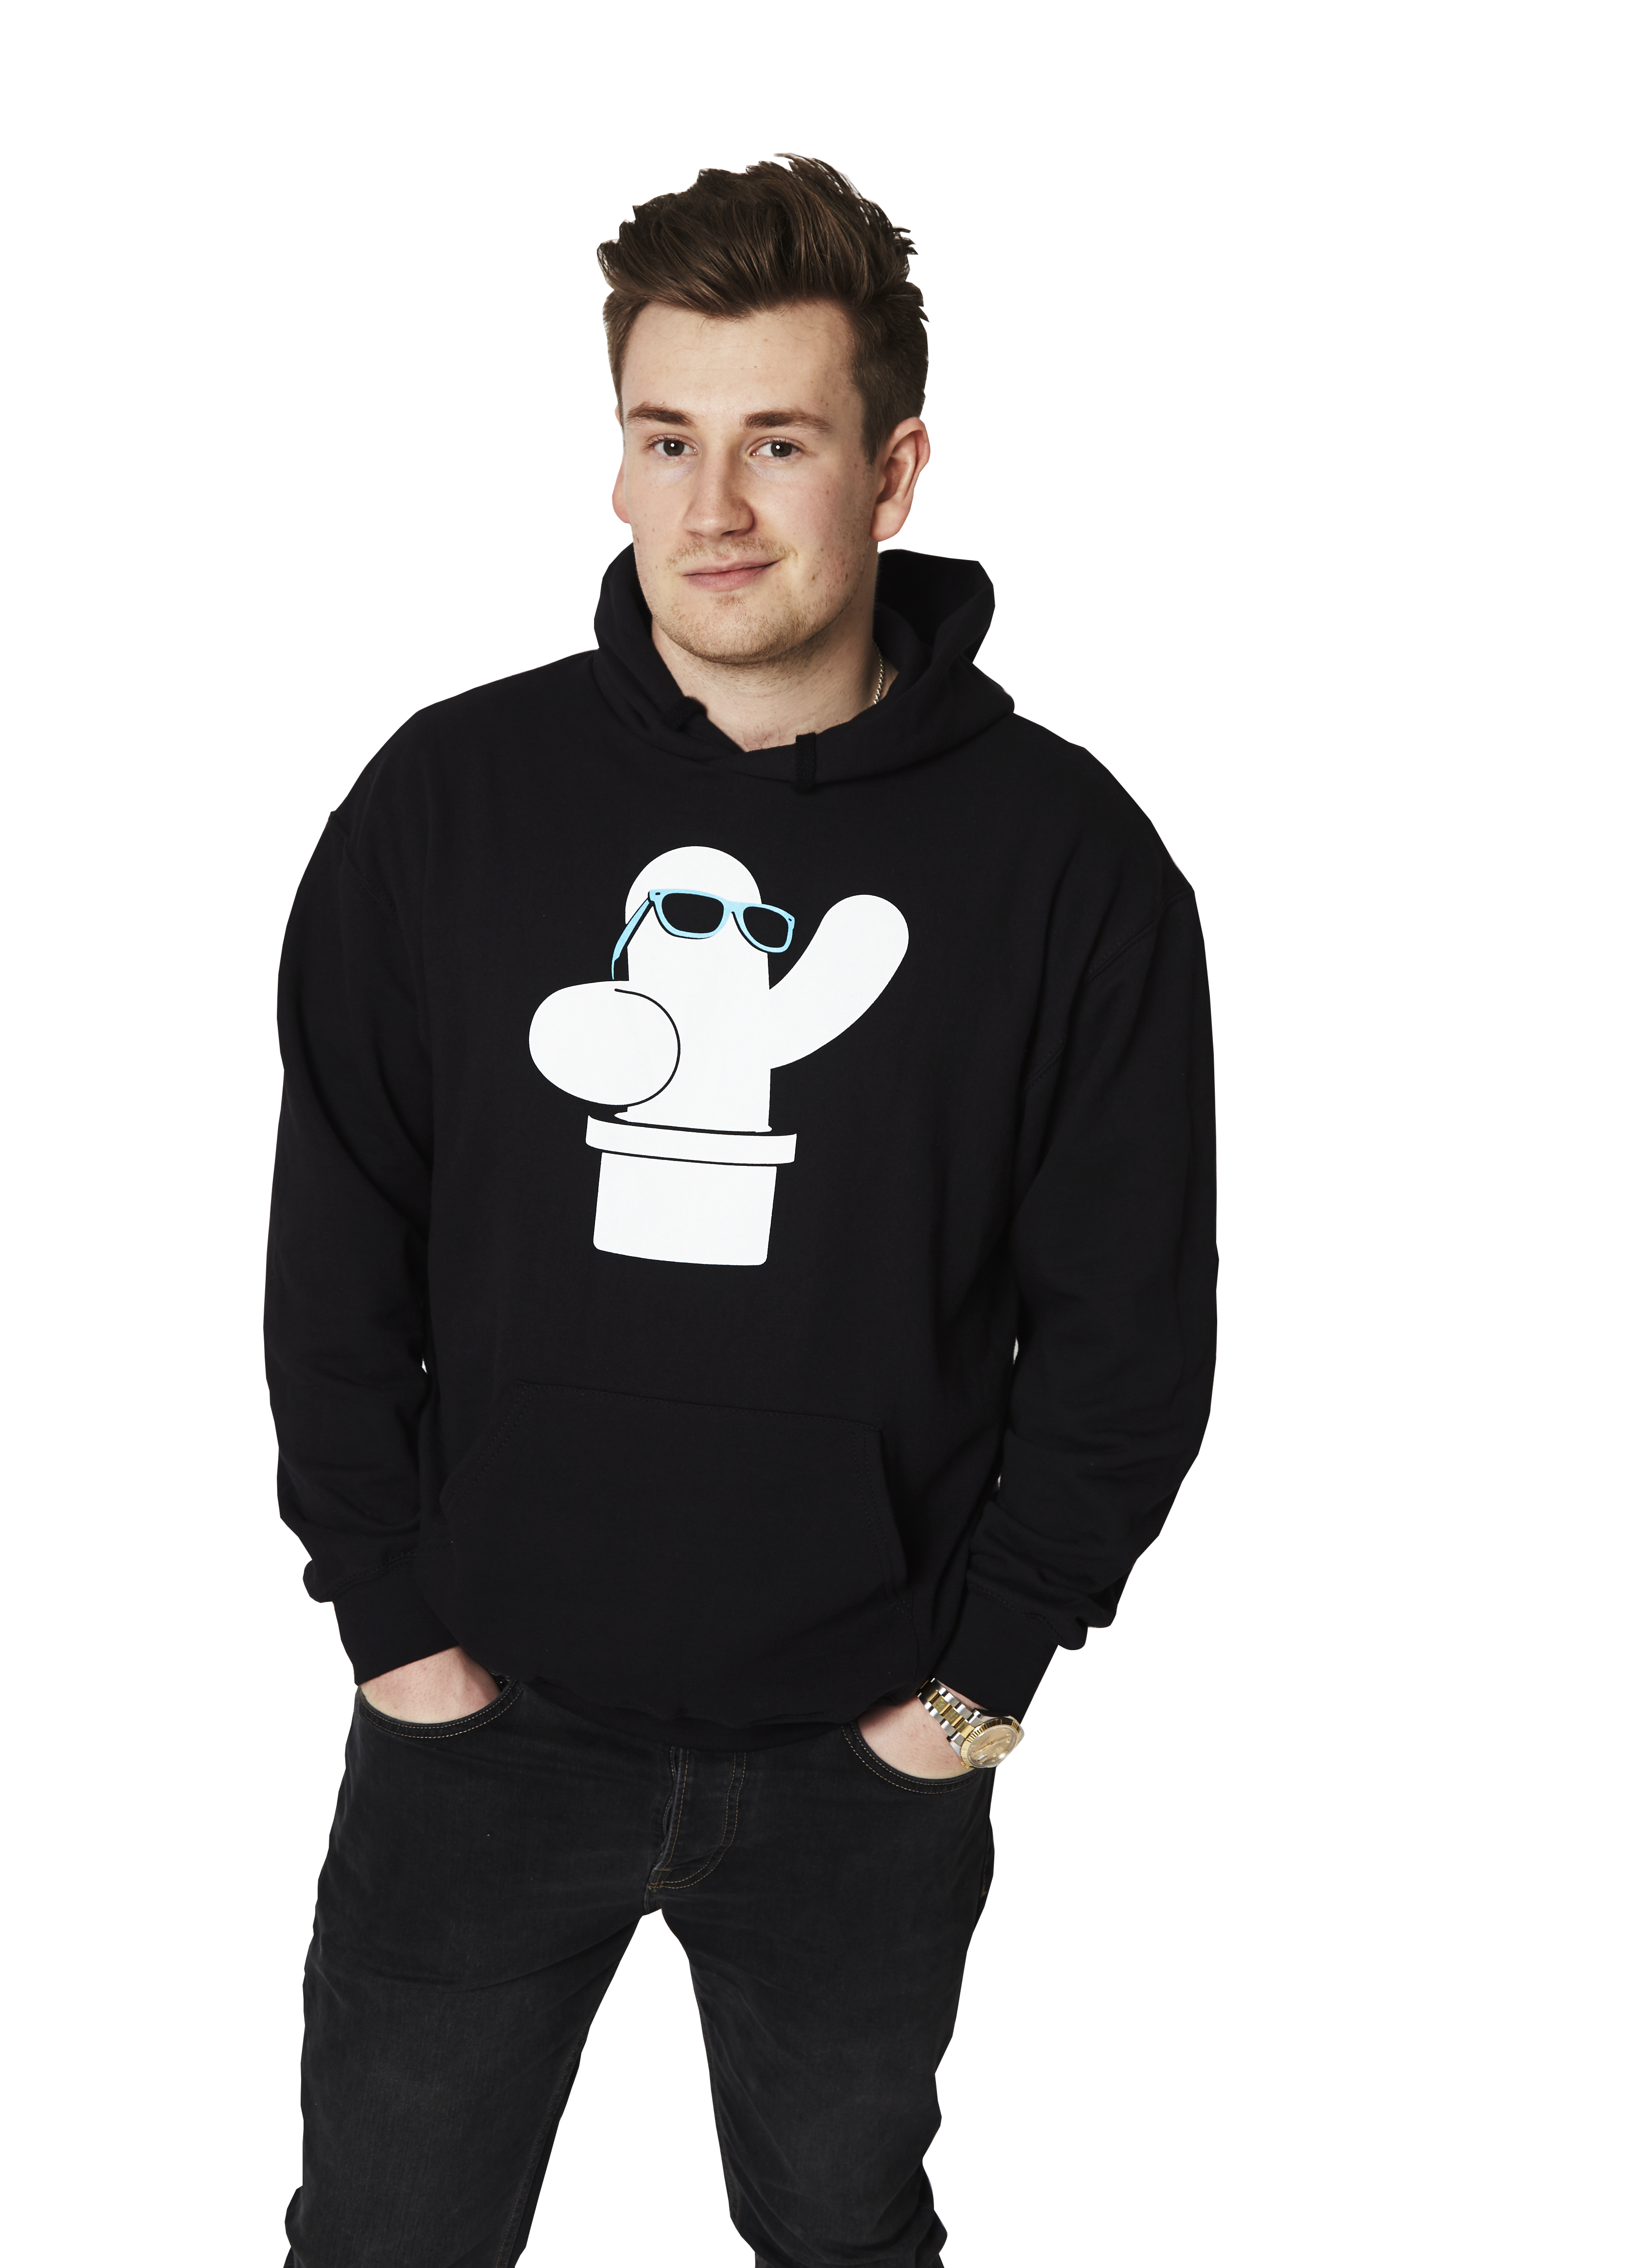 Cactus Boy Hoodie Cactus Boy Store Sweatshirts Boy Hoodie Graphic Sweatshirt [ 4669 x 3358 Pixel ]